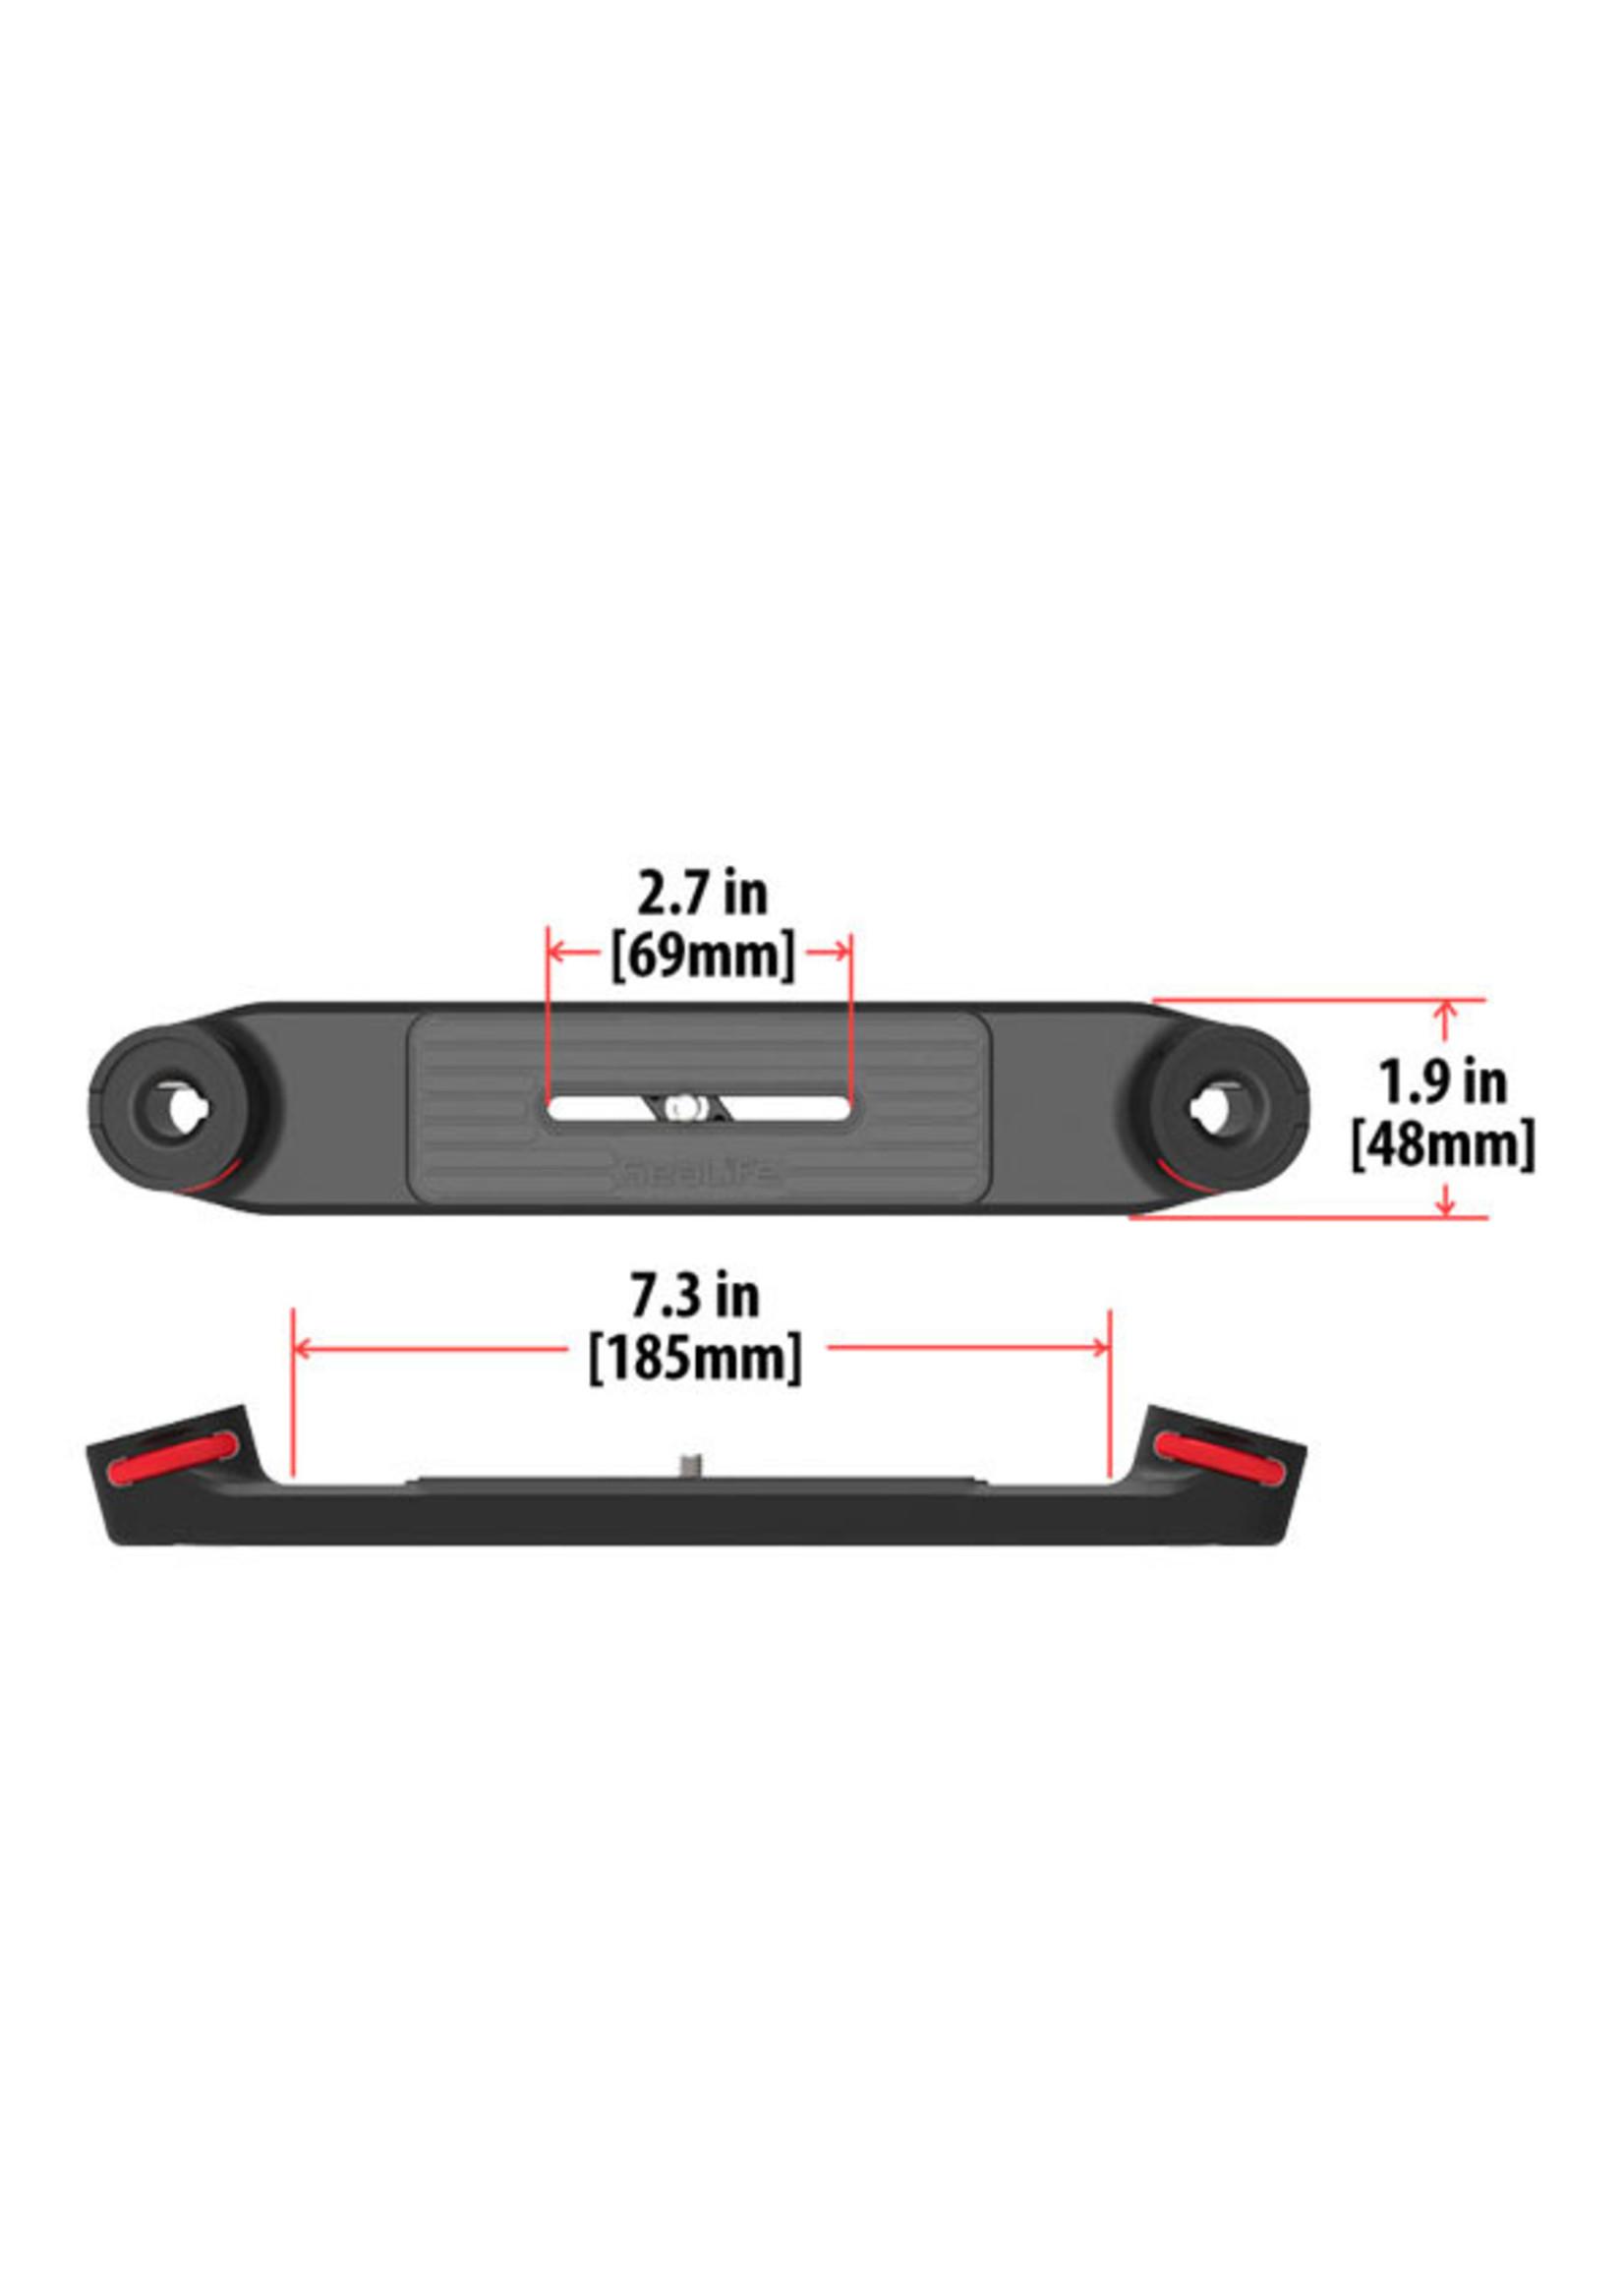 Sealife Flex-Connect Dual Tray